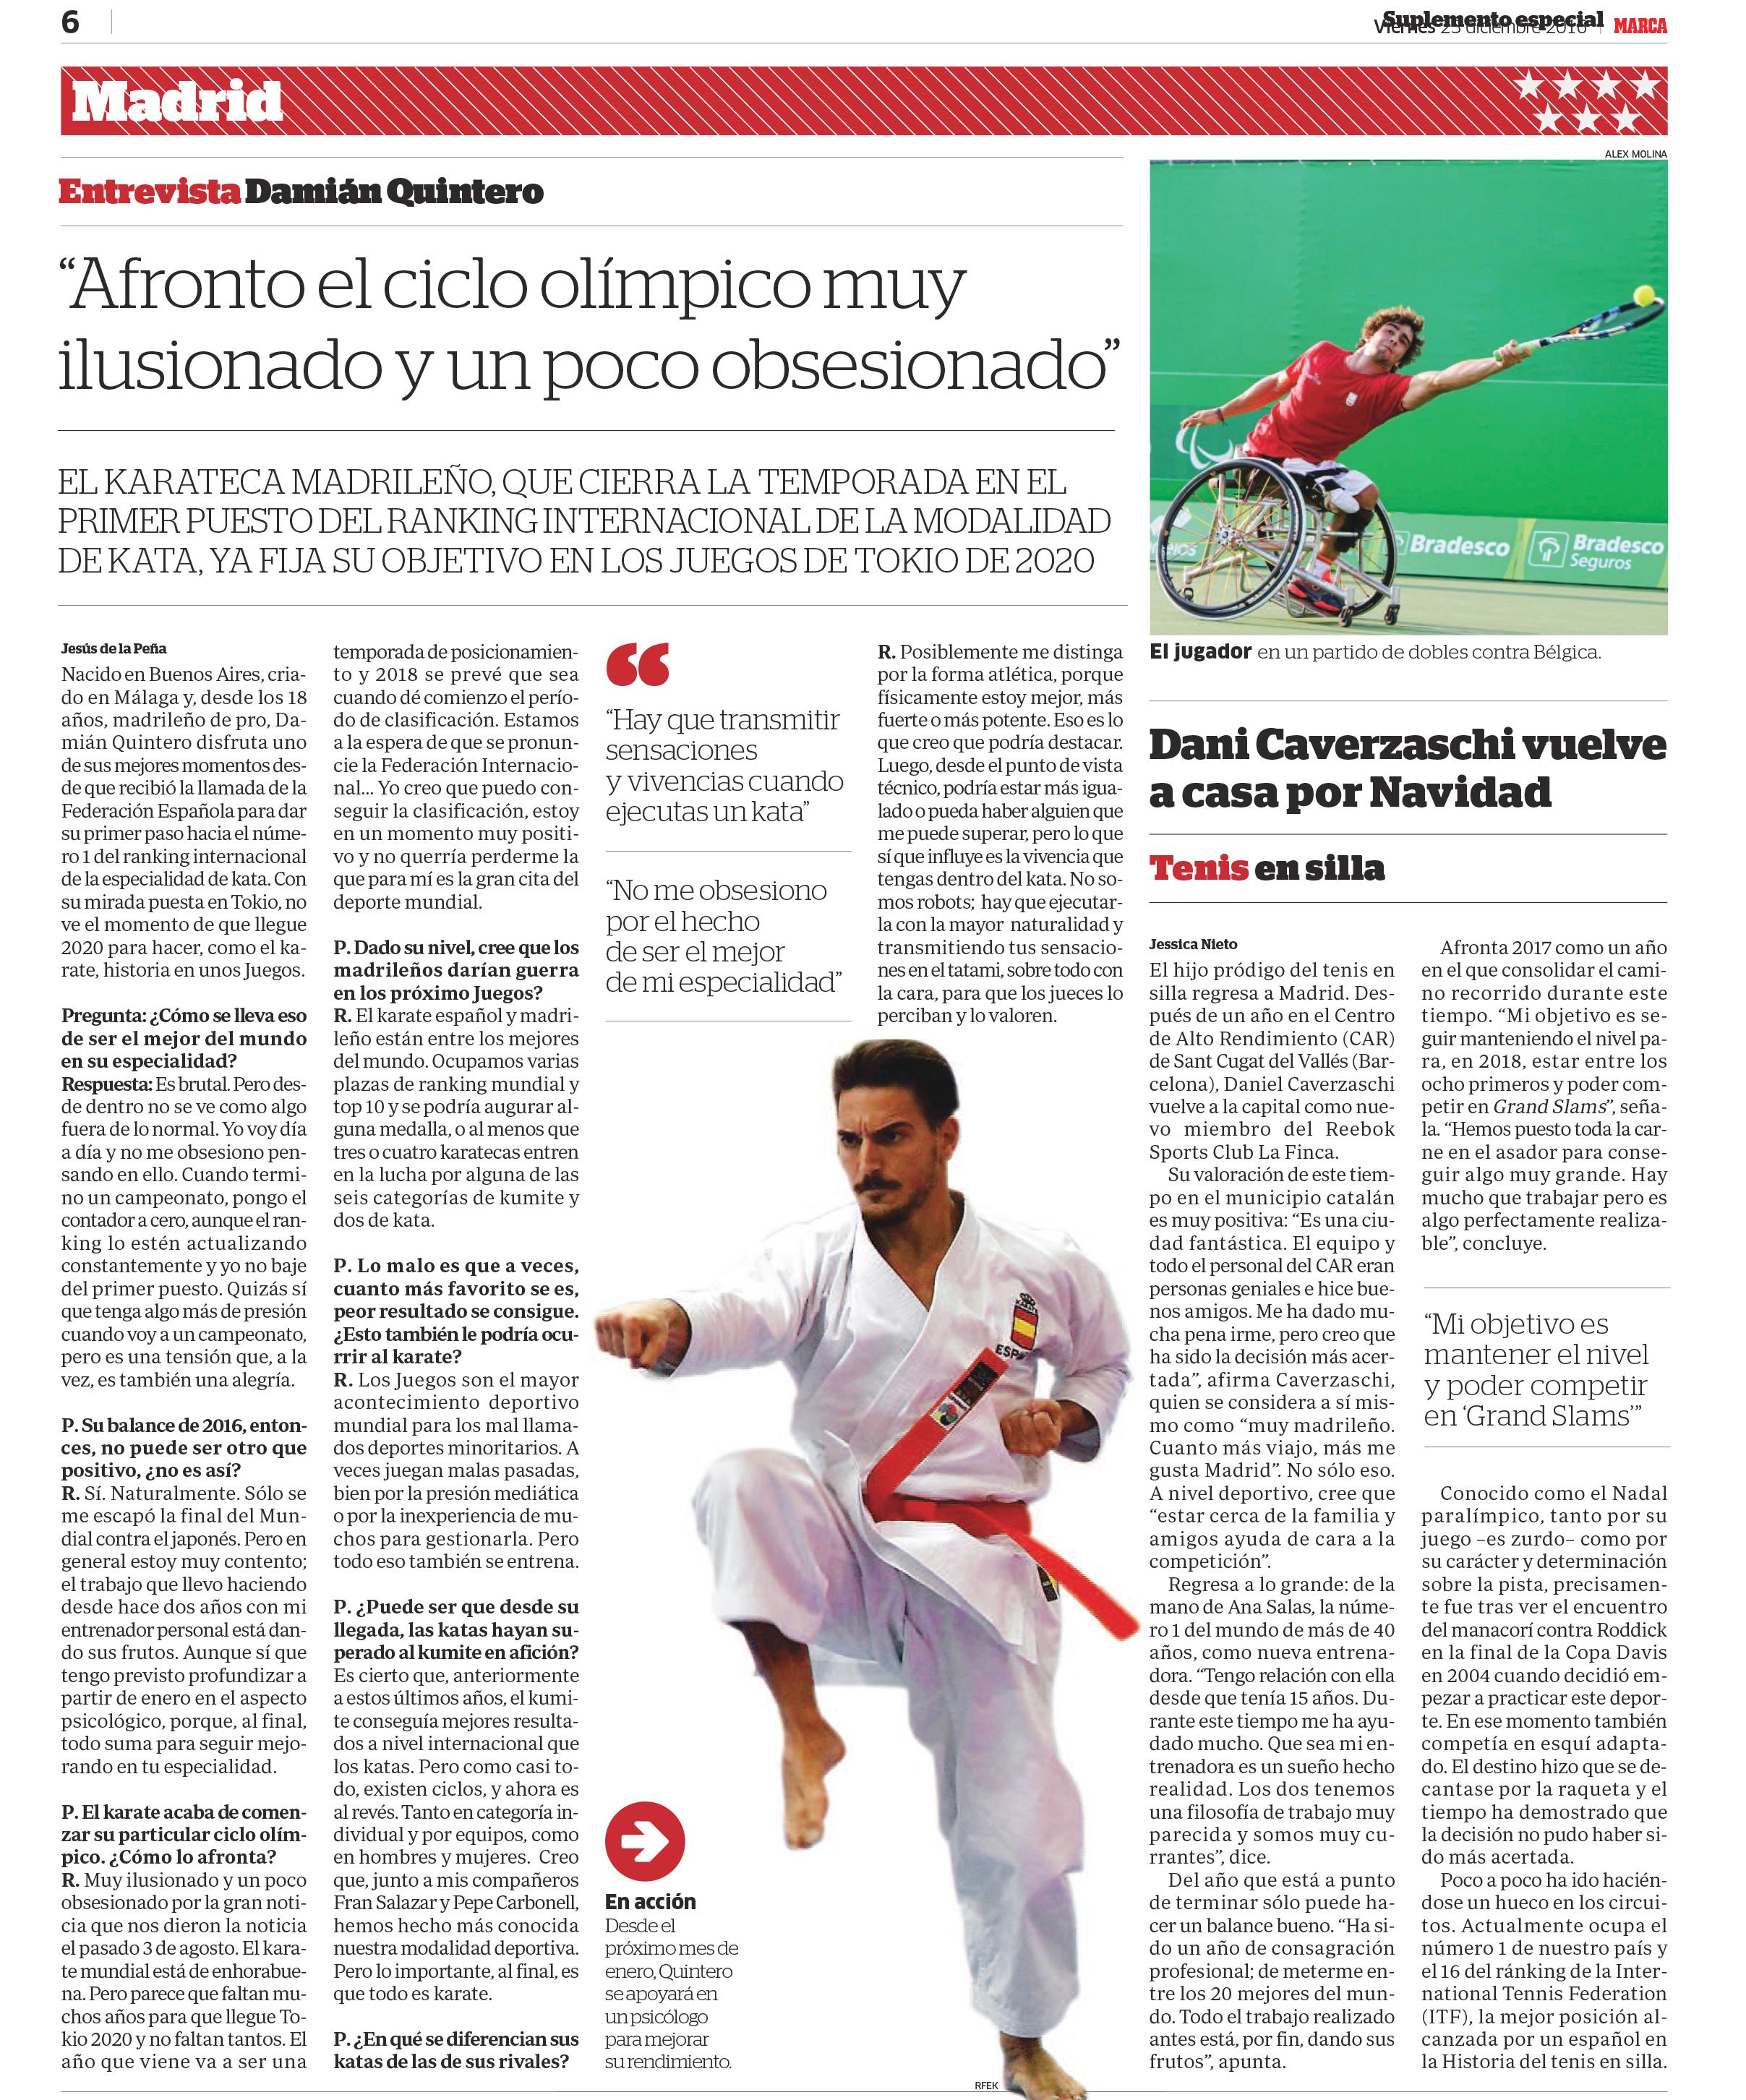 Damian-Quintero-Noticia-MarcaRanking-Kata-Articulo